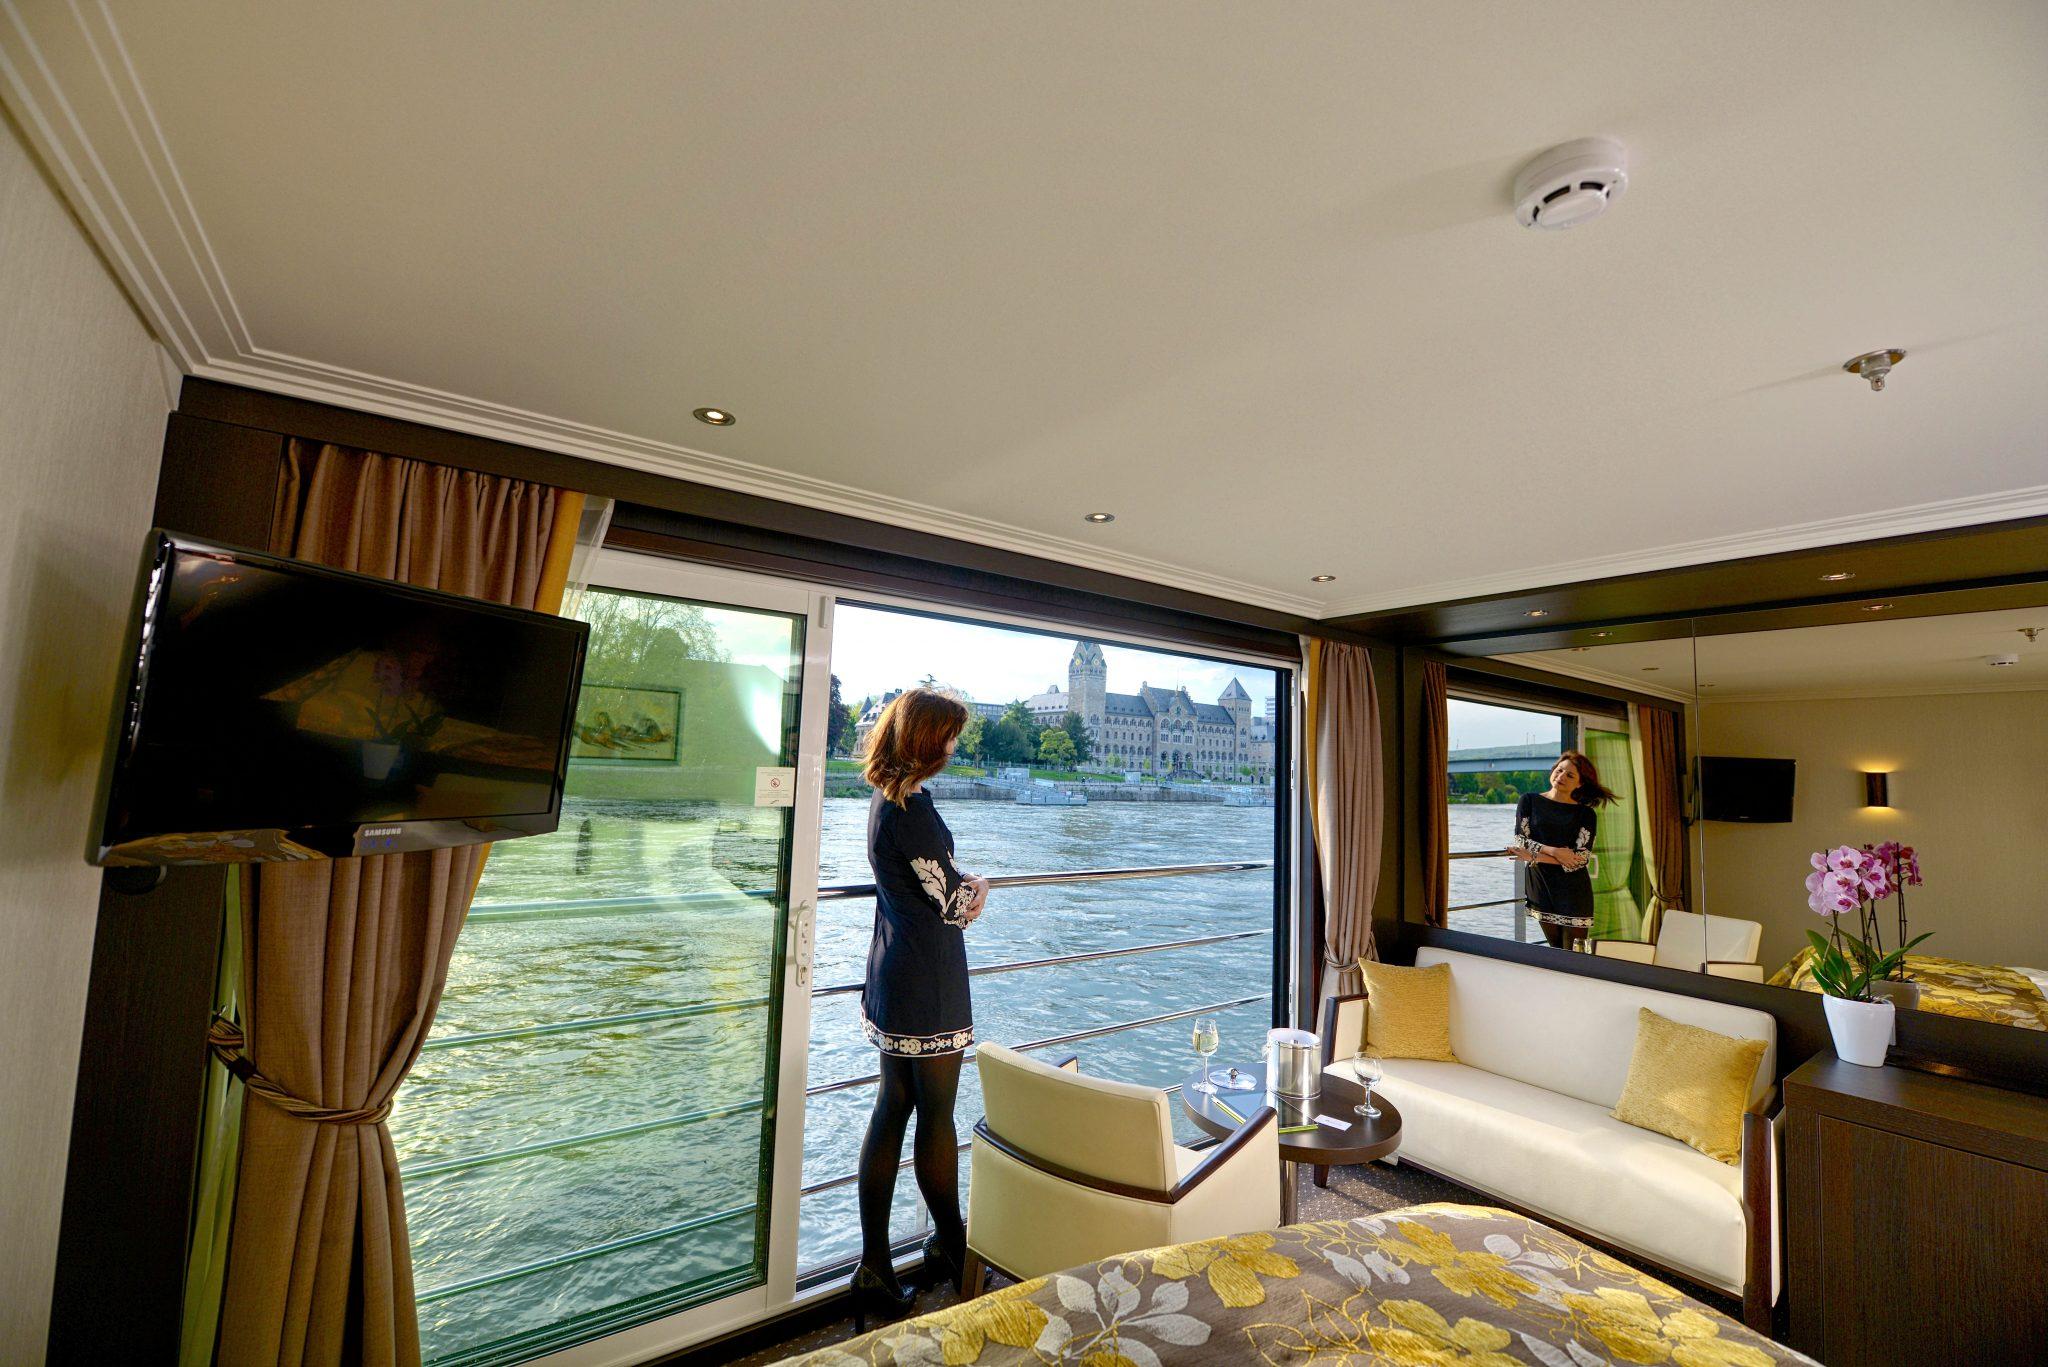 European River Cruise Deals All Inclusive Cruises With Airfare - Cruises with airfare